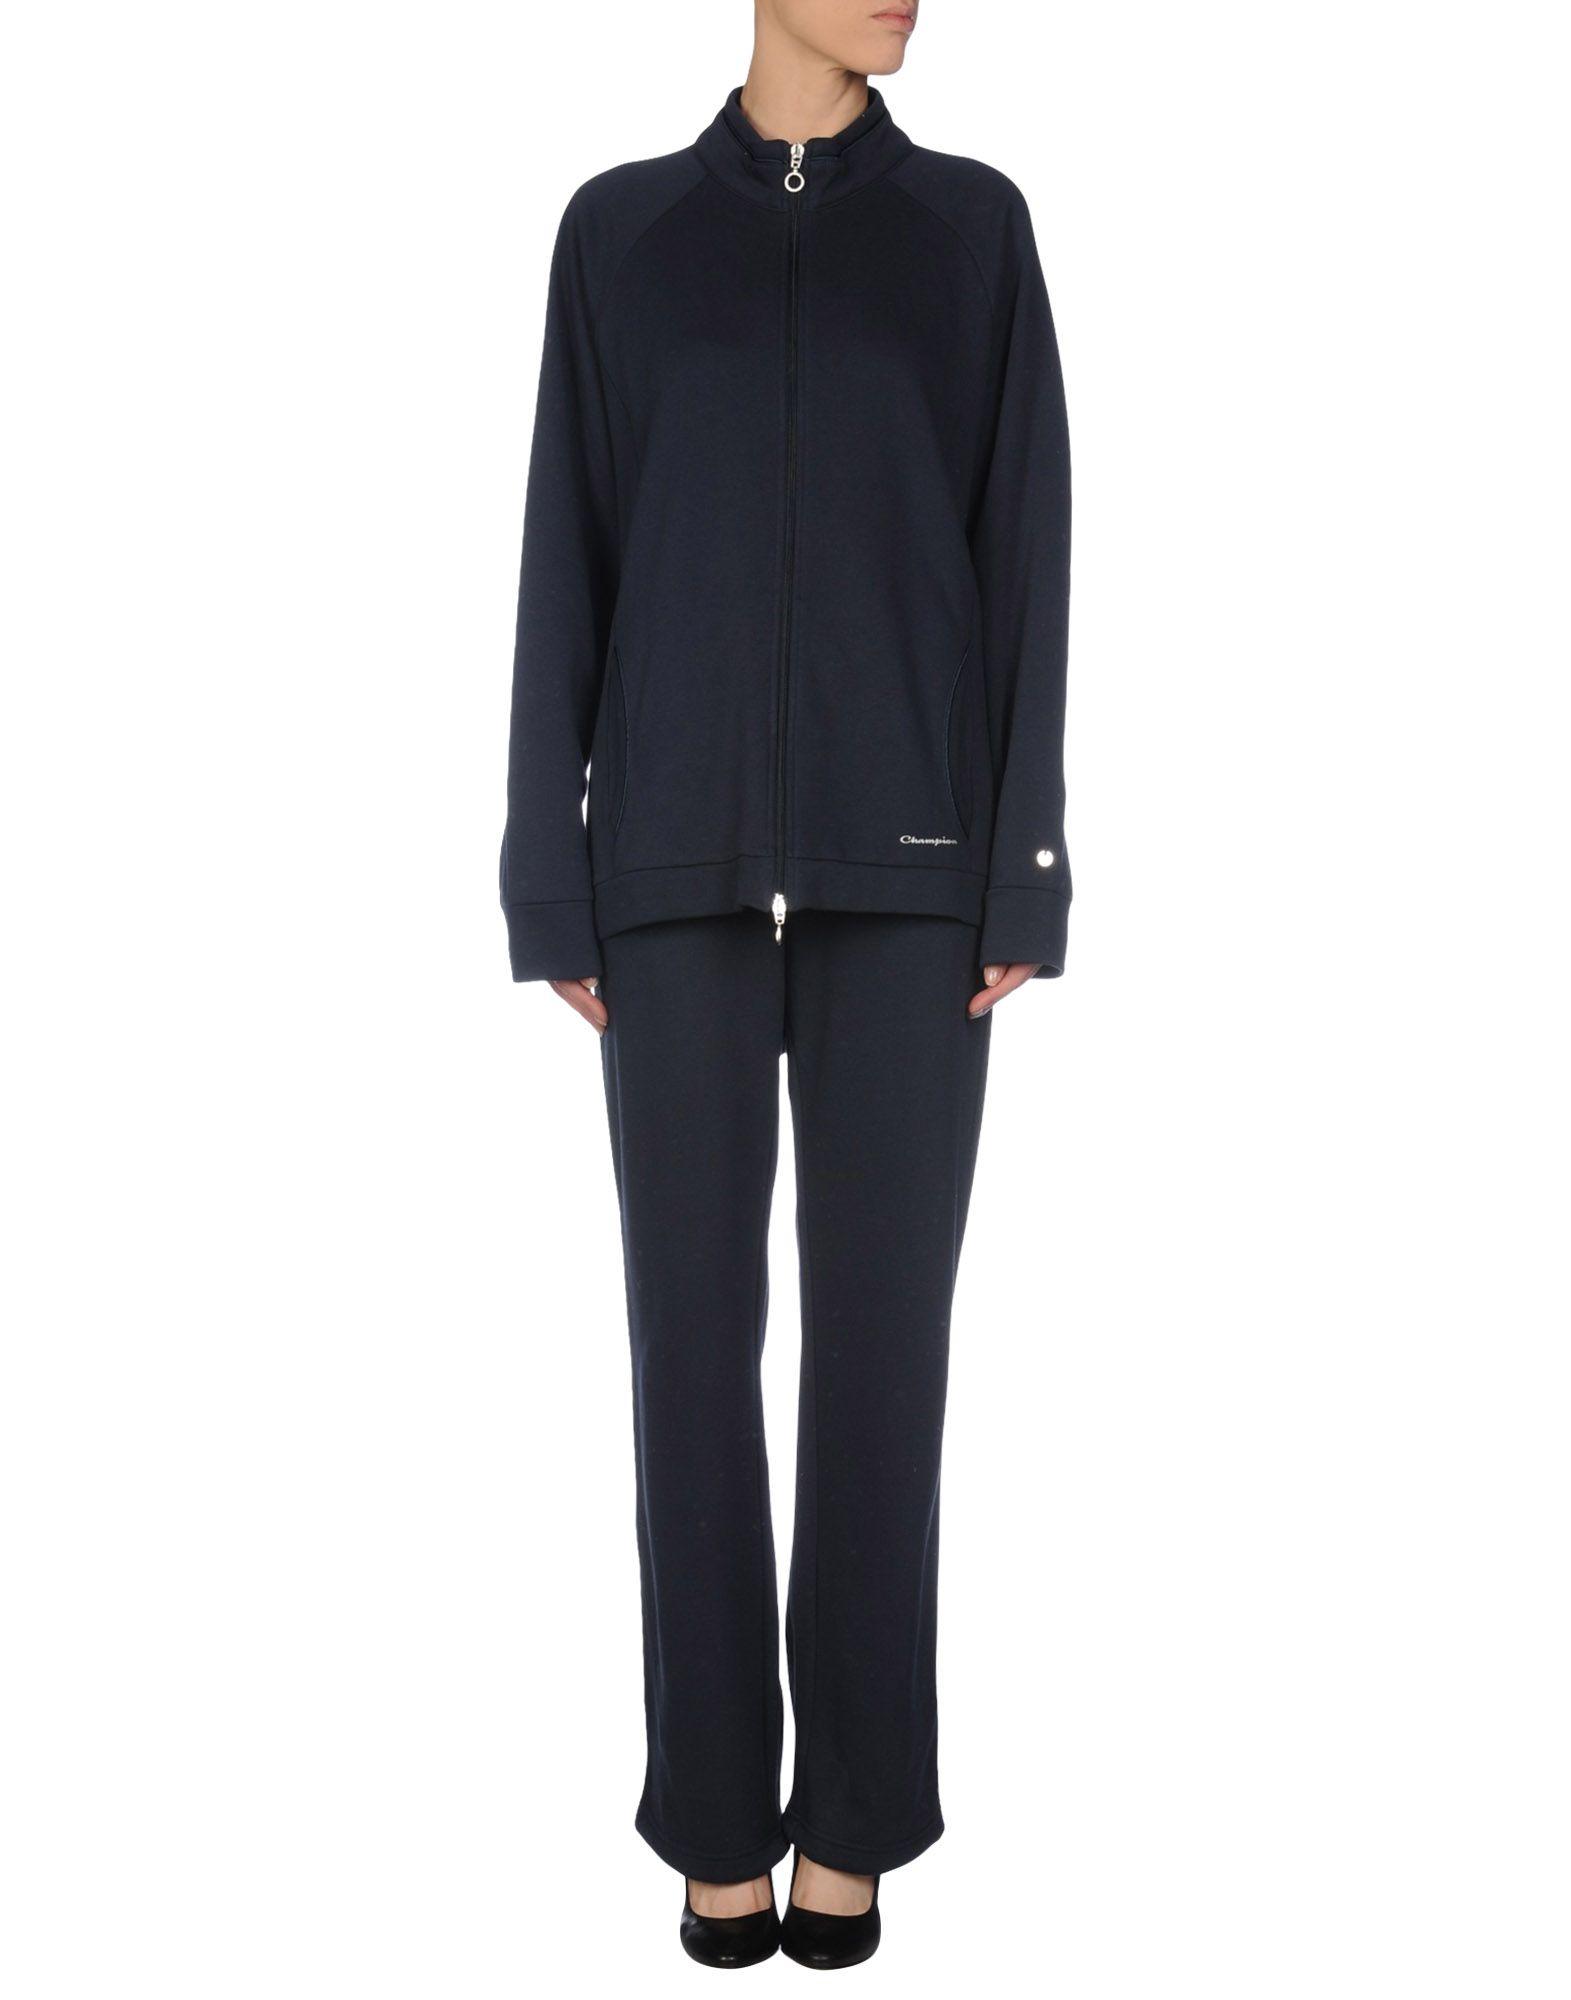 Vivienne Westwood Womens Jeans